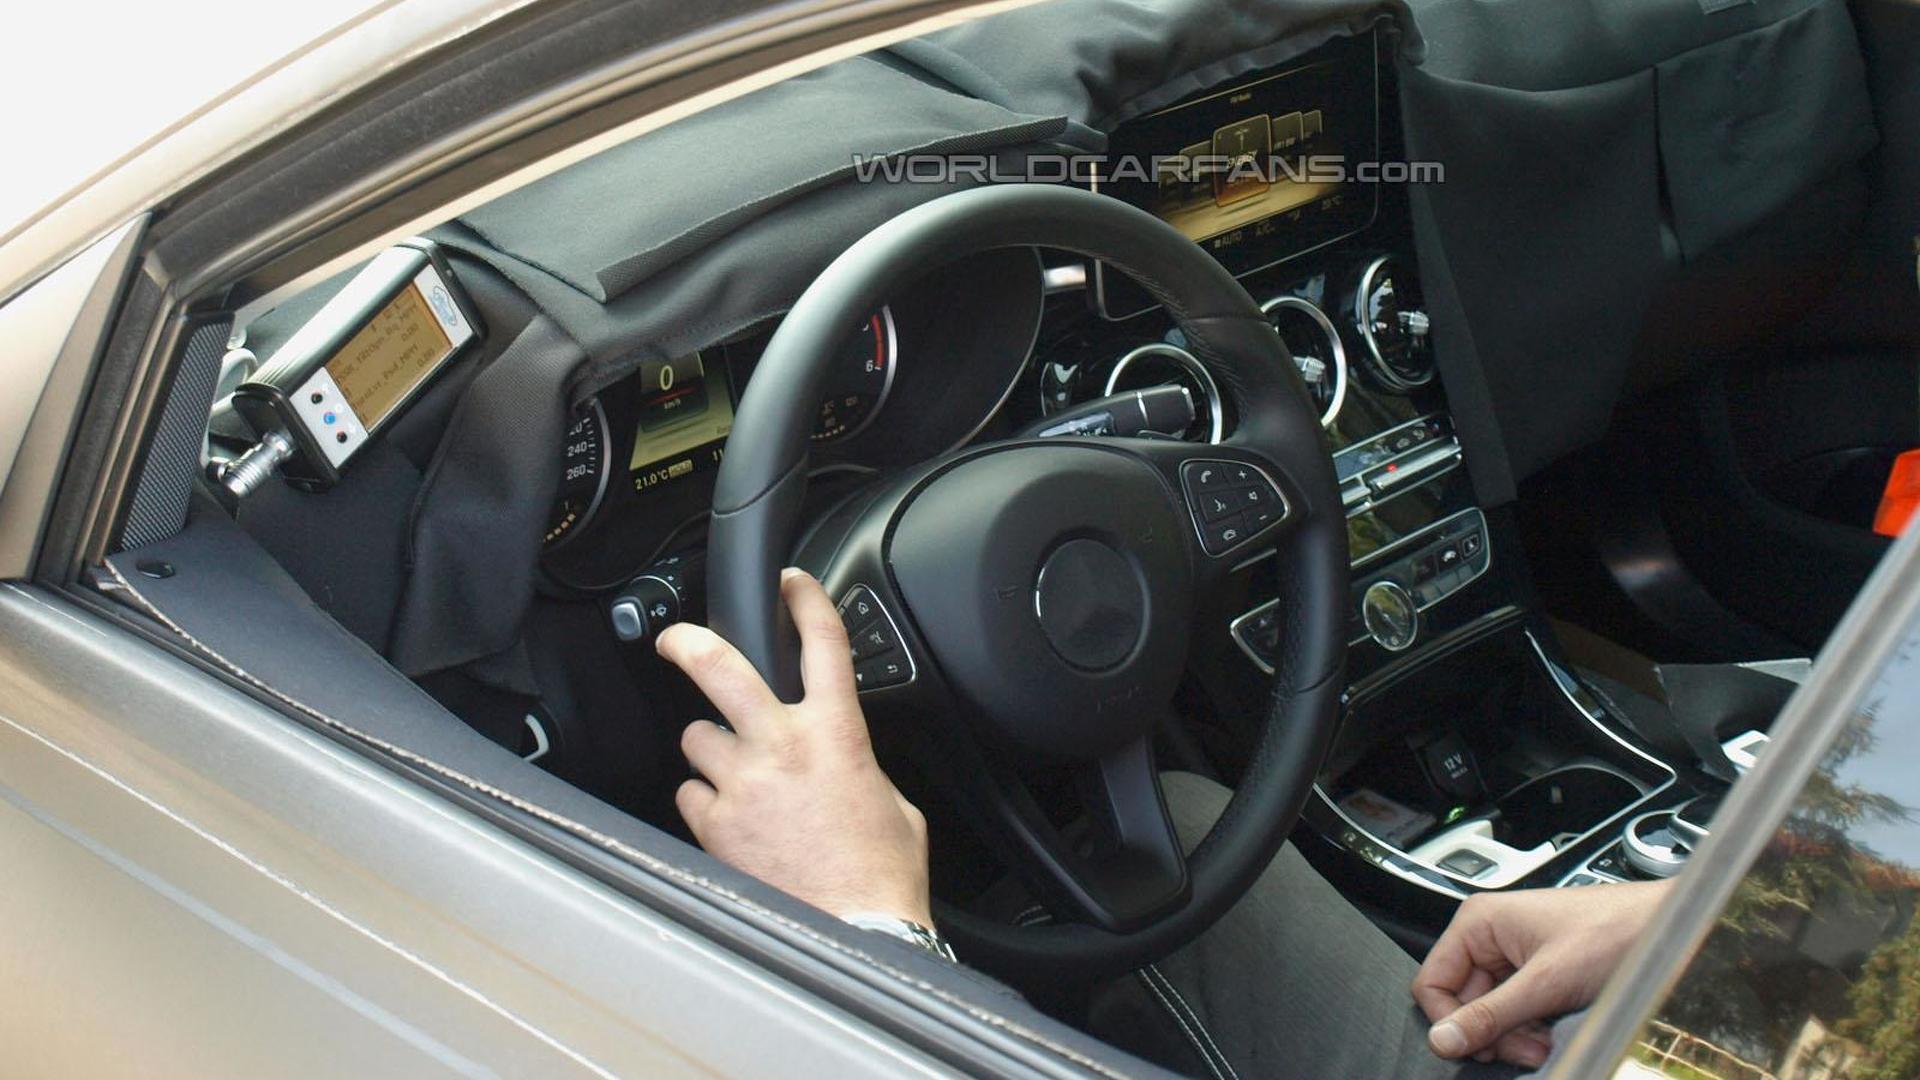 2014 Mercedes C-Class sheds camo, shows off interior in latest spy photos